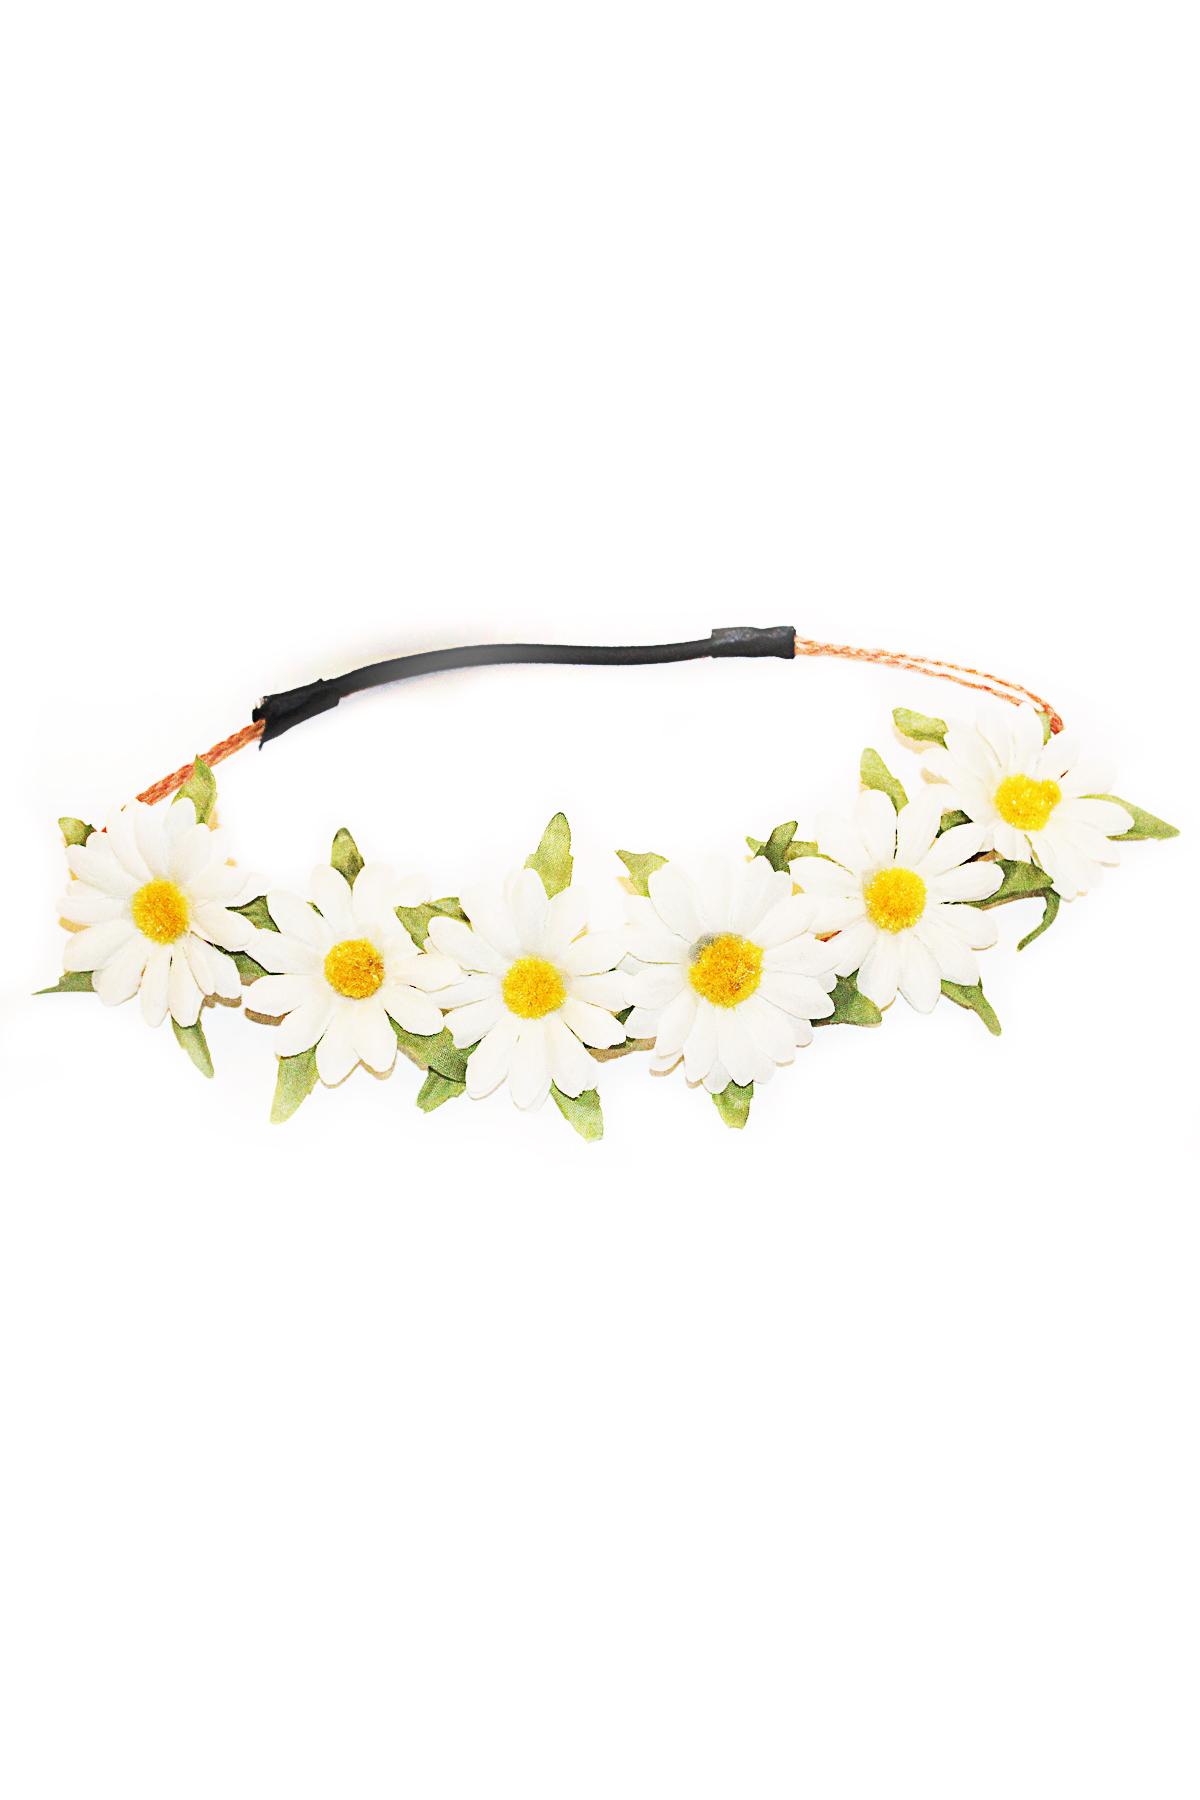 Daisy floral headband — simply chic